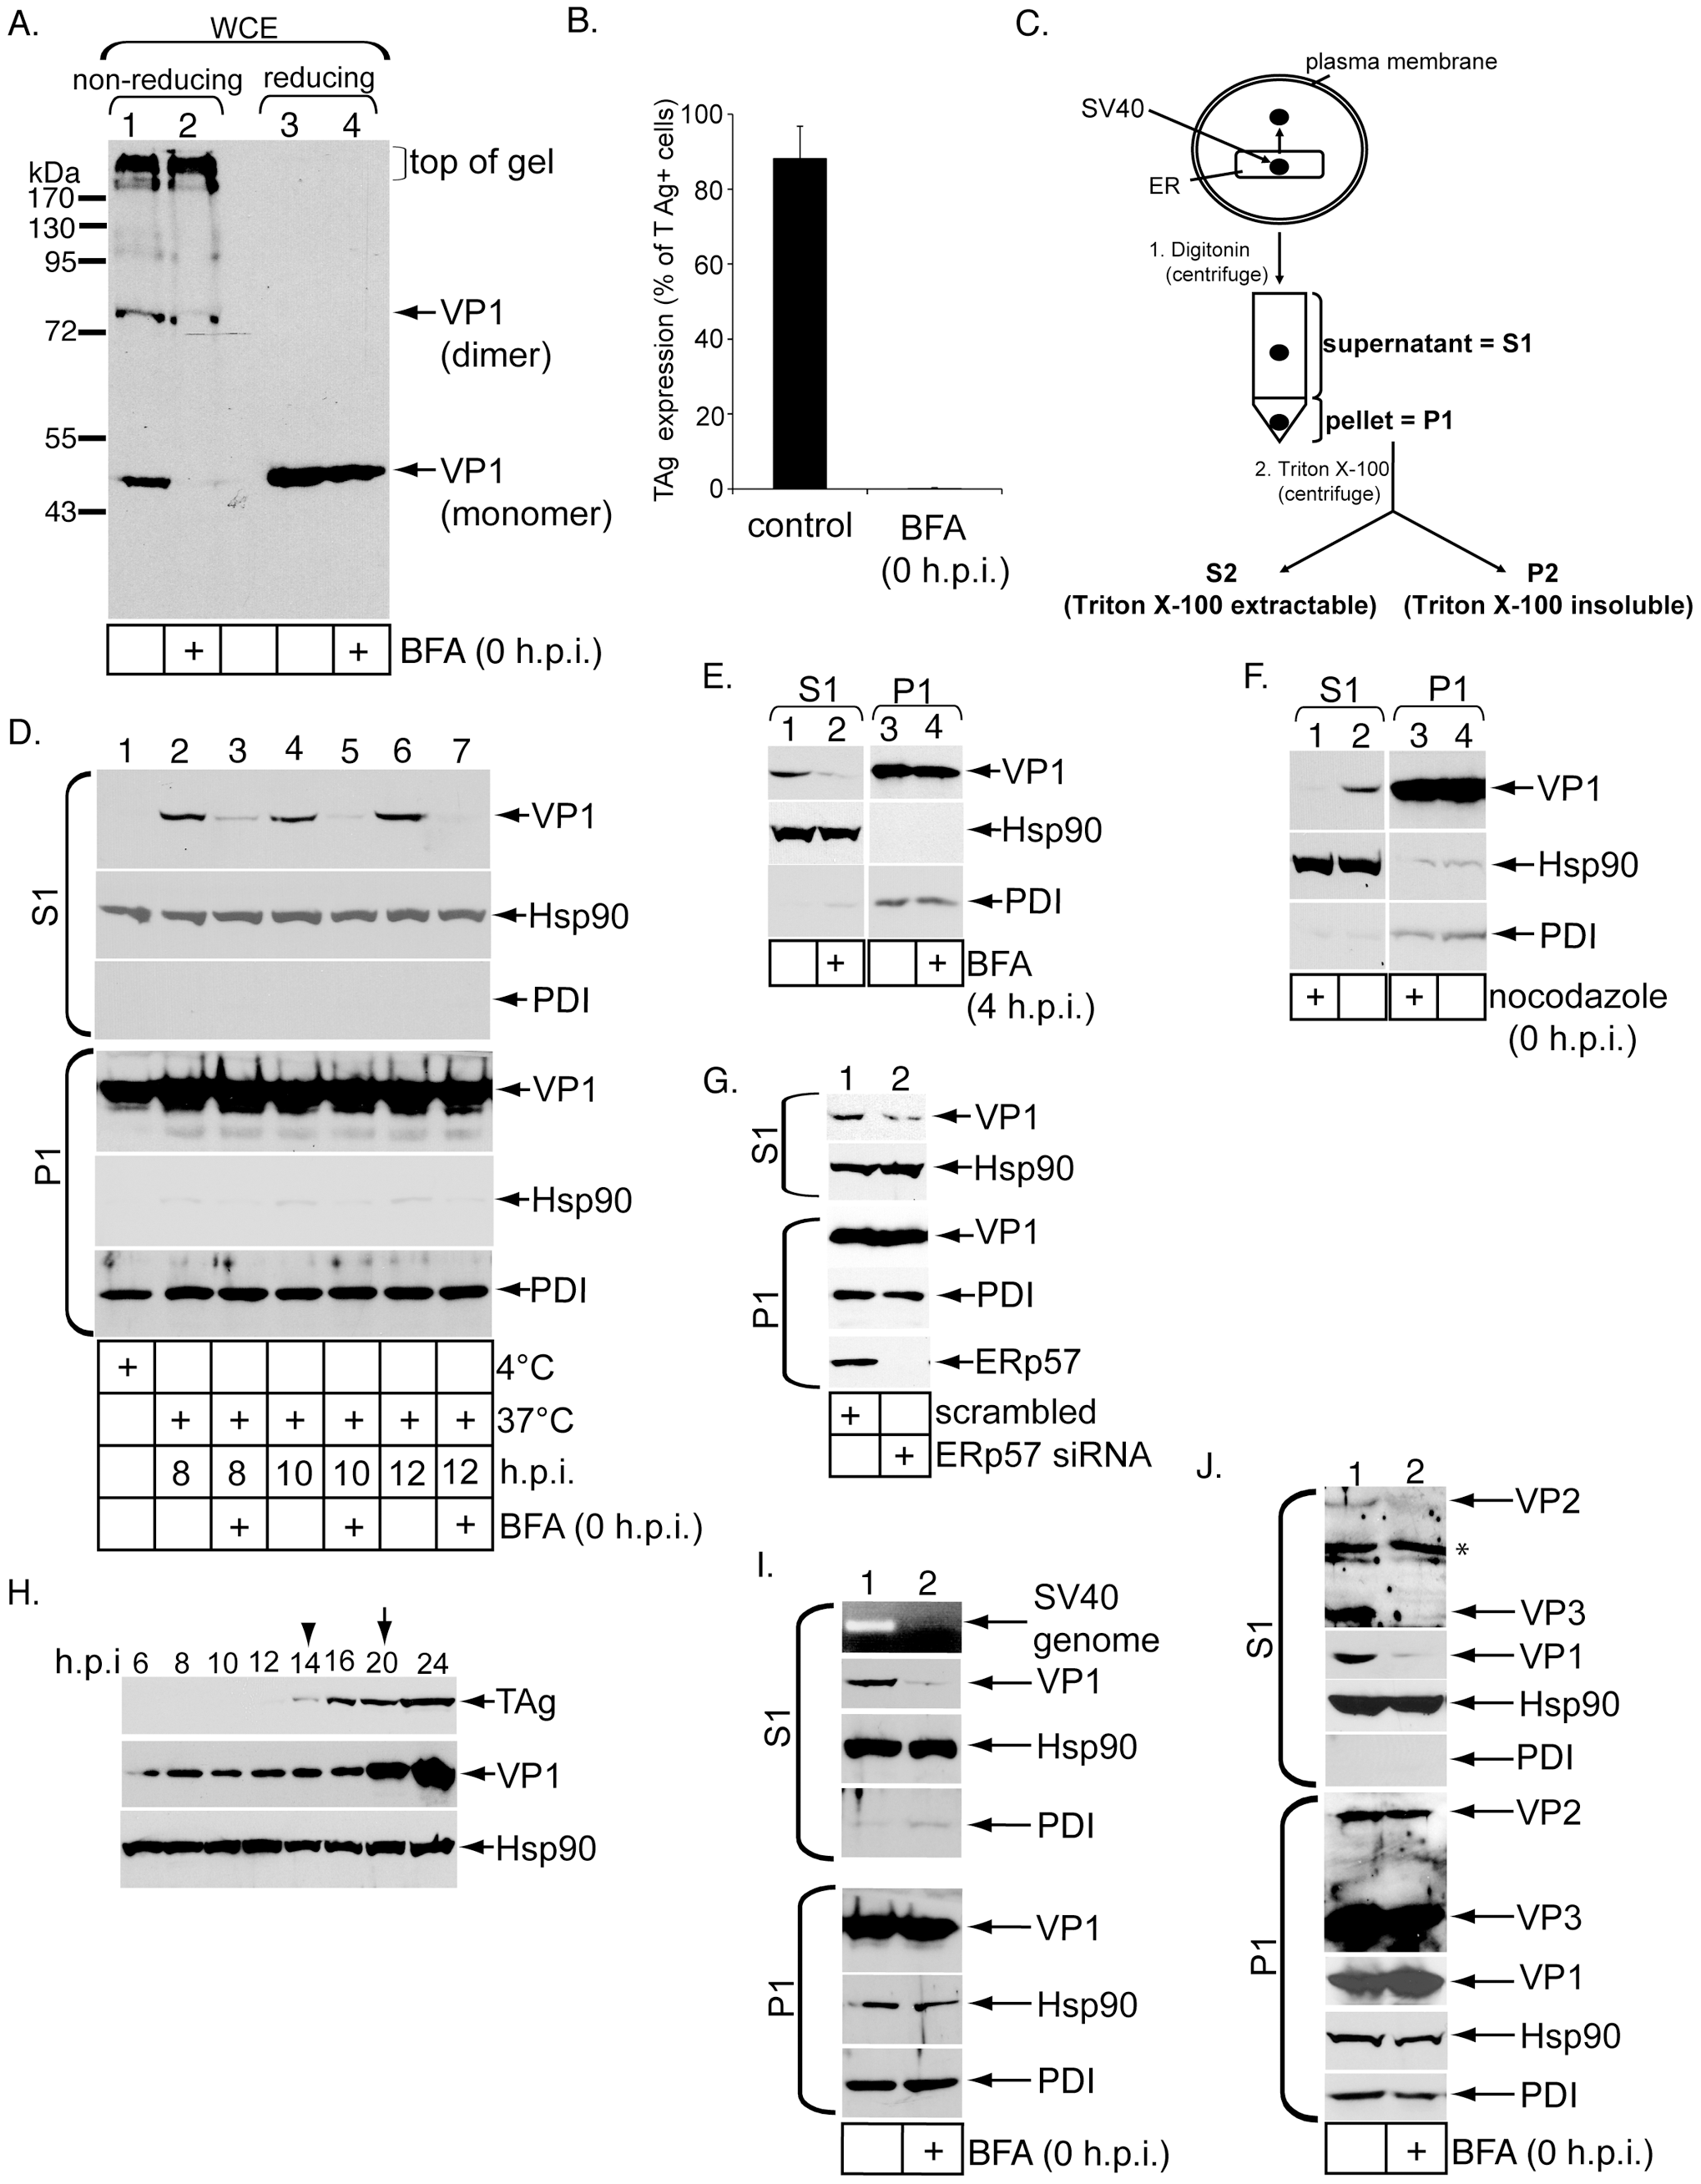 Establishment of a cell-based ER-to-cytosol membrane penetration assay for SV40.